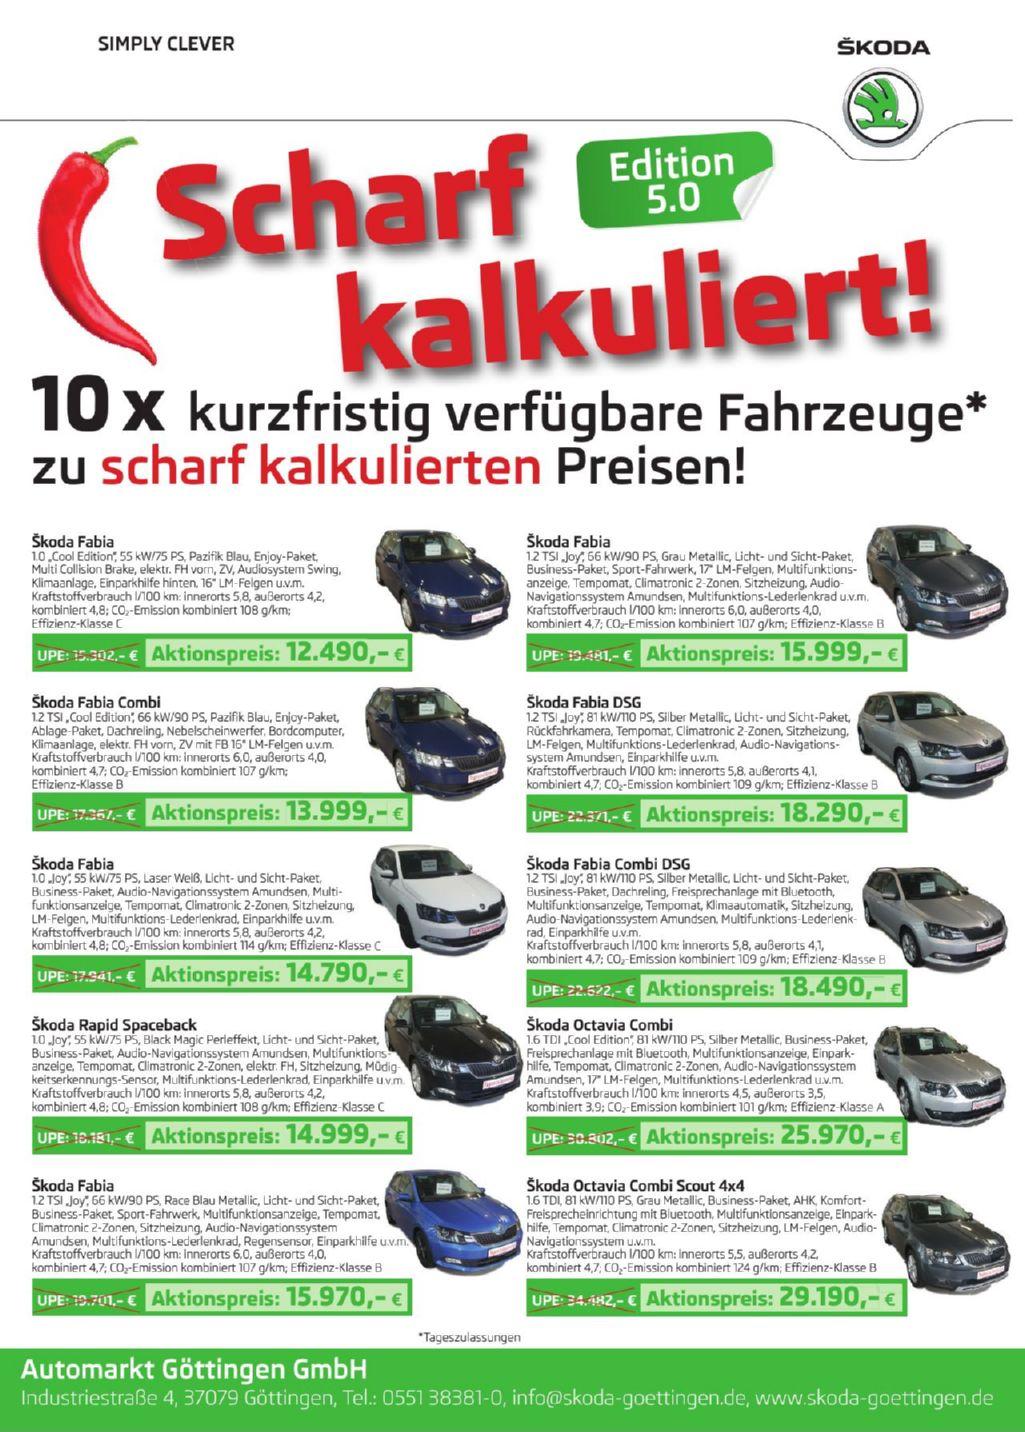 Kuche Total Gottingen Bewertung The Compressed Air Specialist